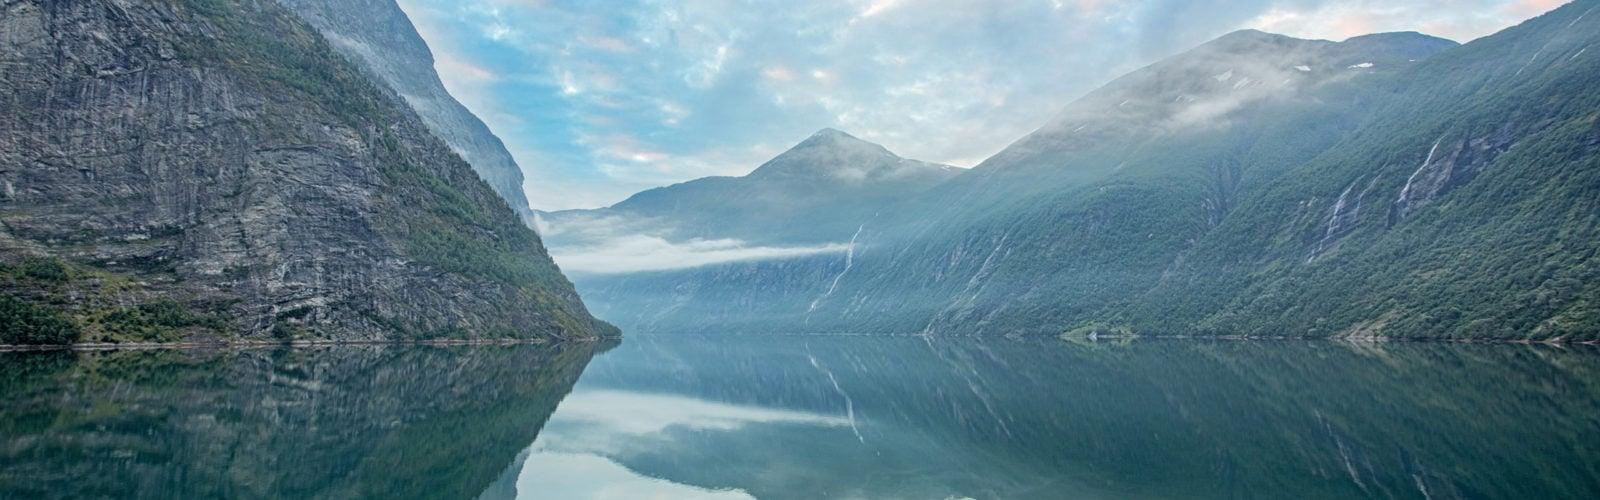 geirangerfjord-norway-sunrise